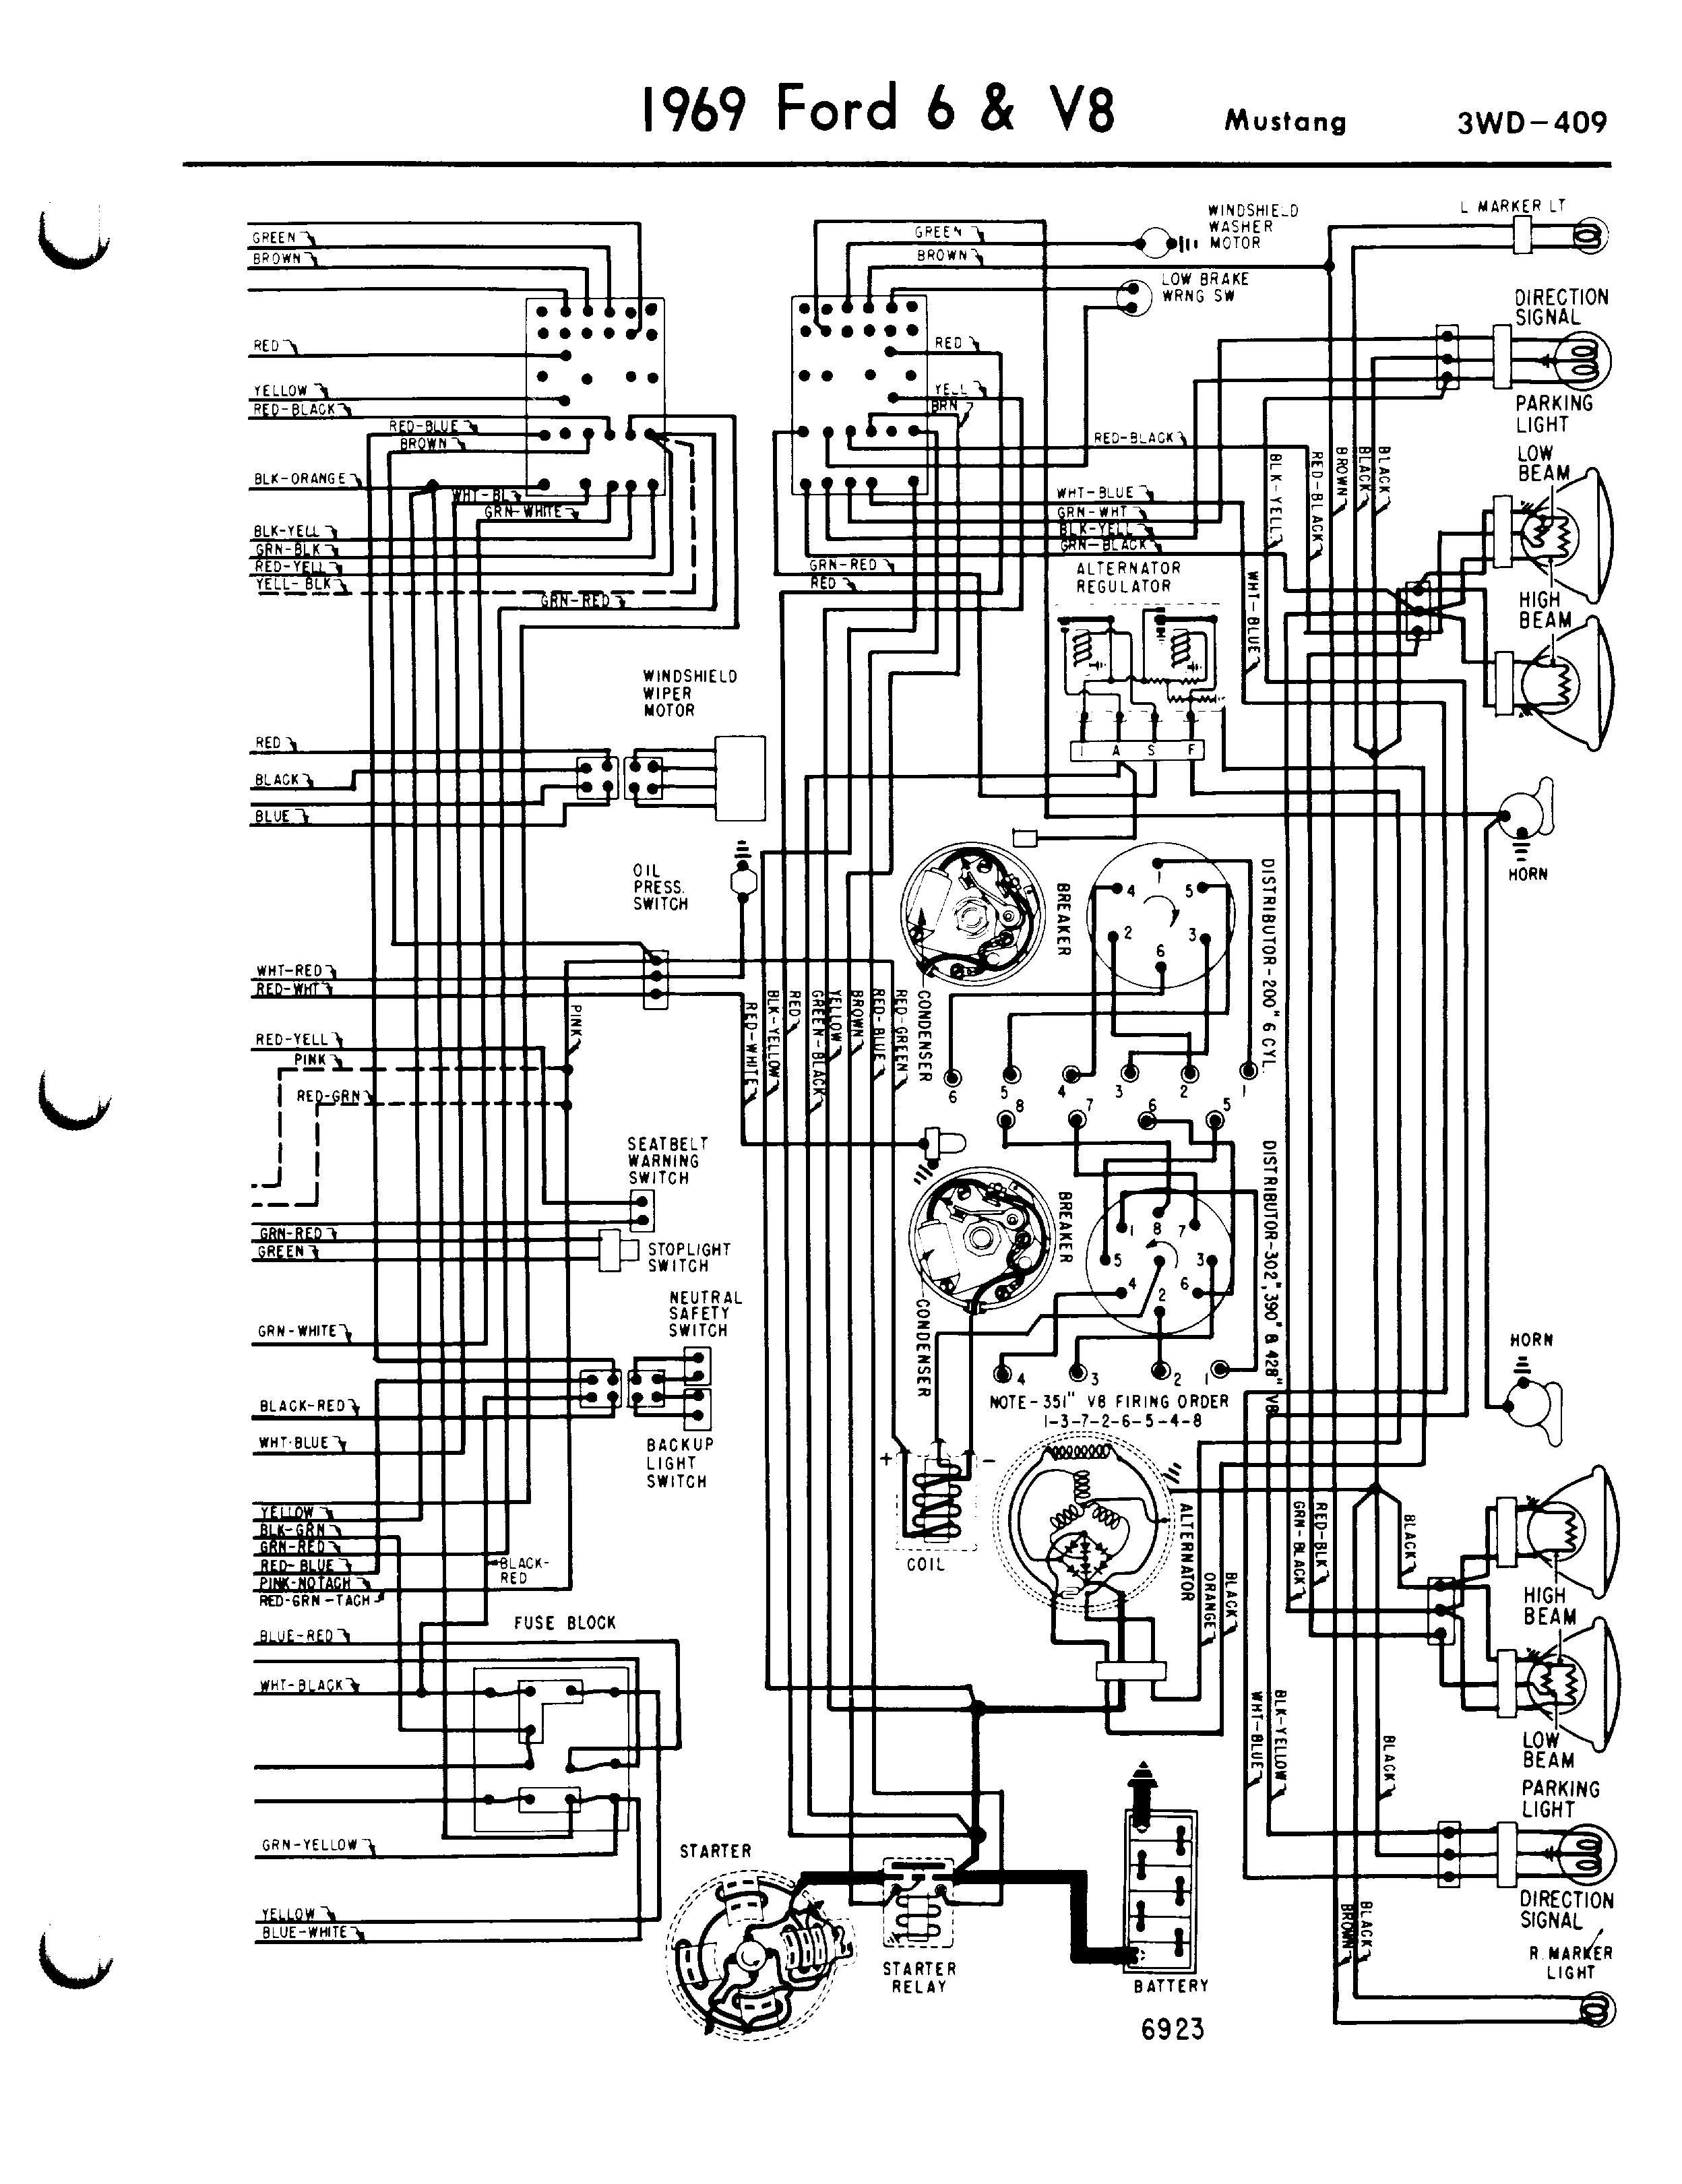 1968 Mustang Turn Signal Switch Diagram Wiring Schematic 110 Roketa Eagle Atv Wiring Harness For Wiring Diagram Schematics